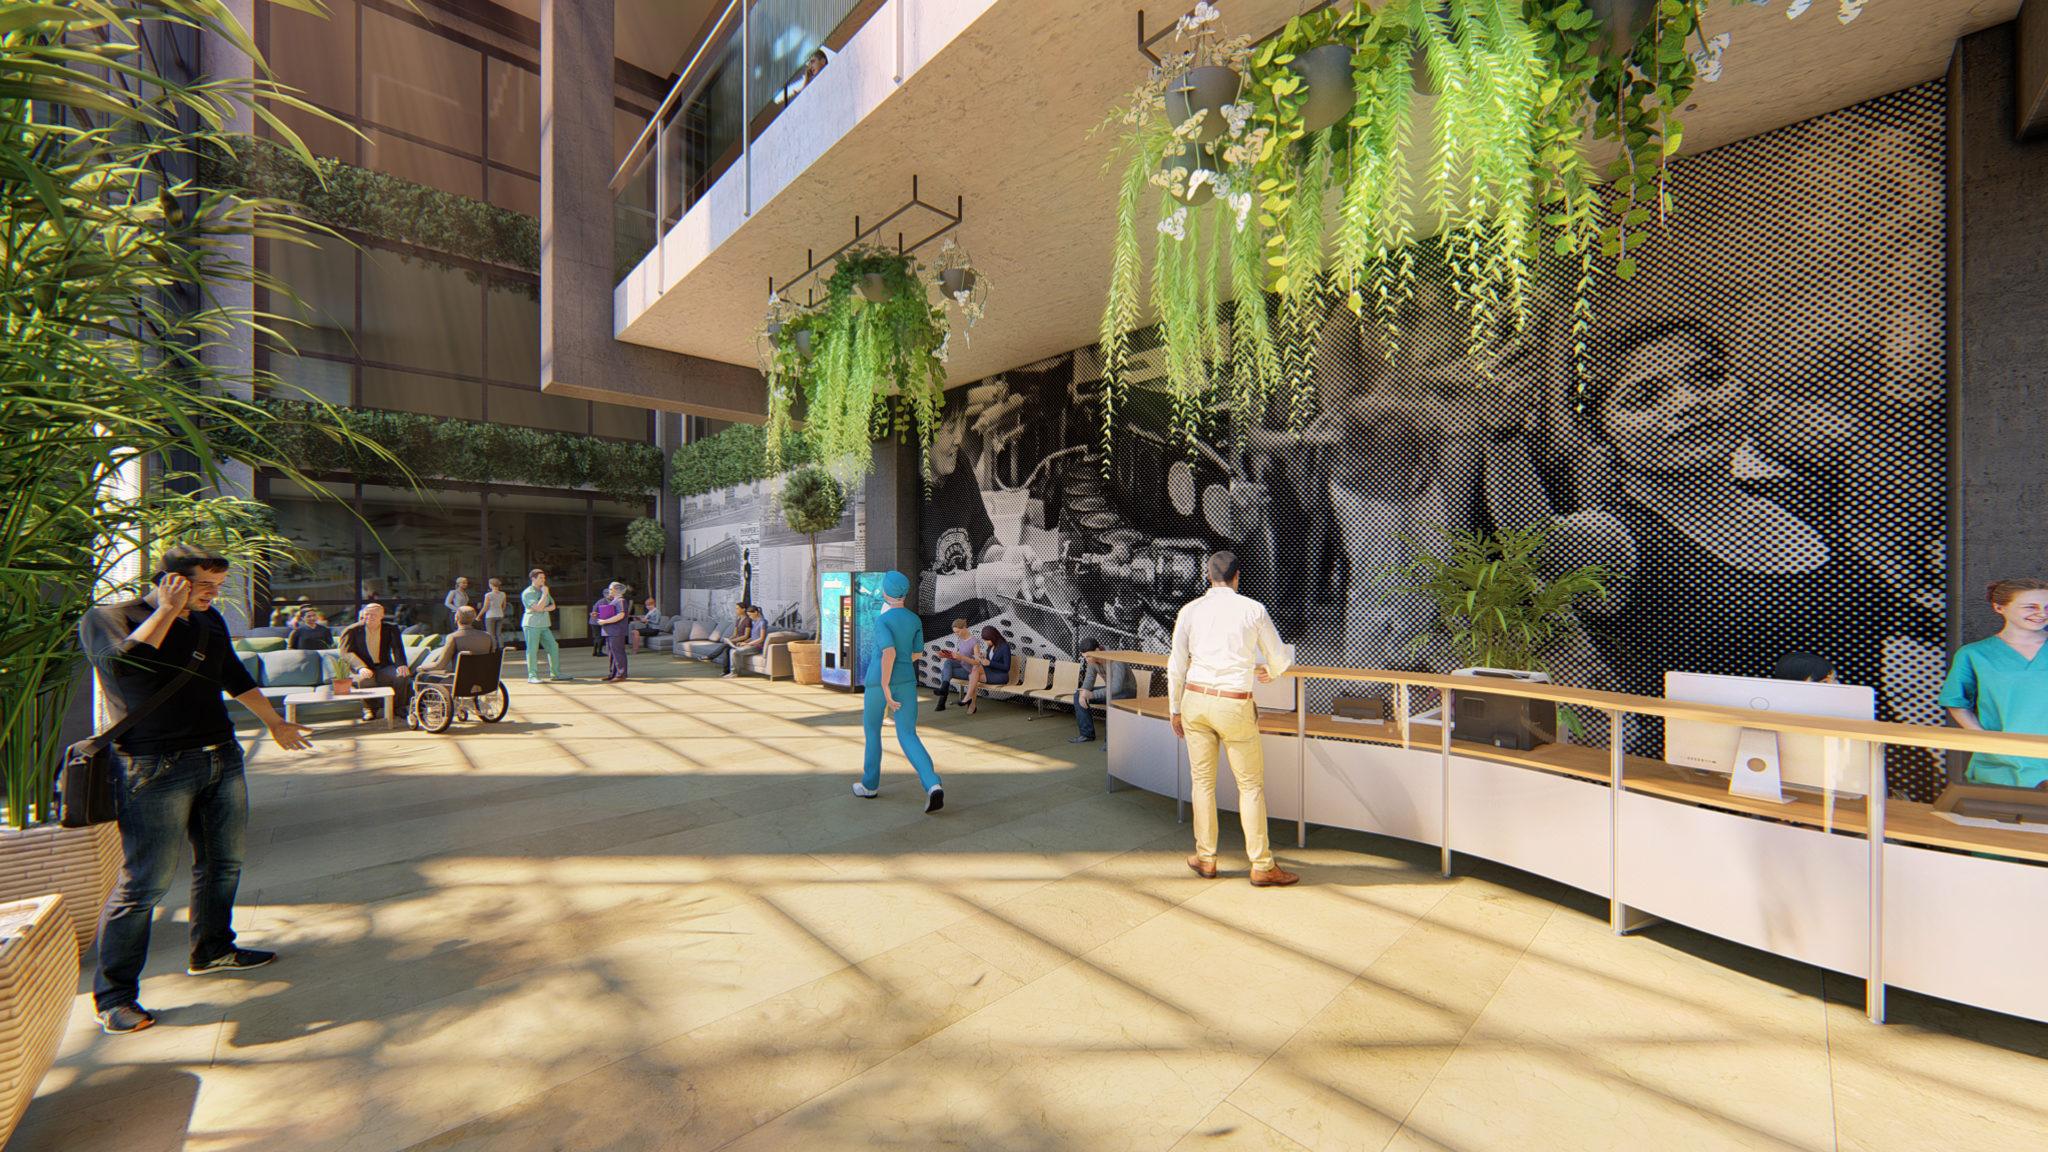 Foyer interpretation wall showcases area's cultural history